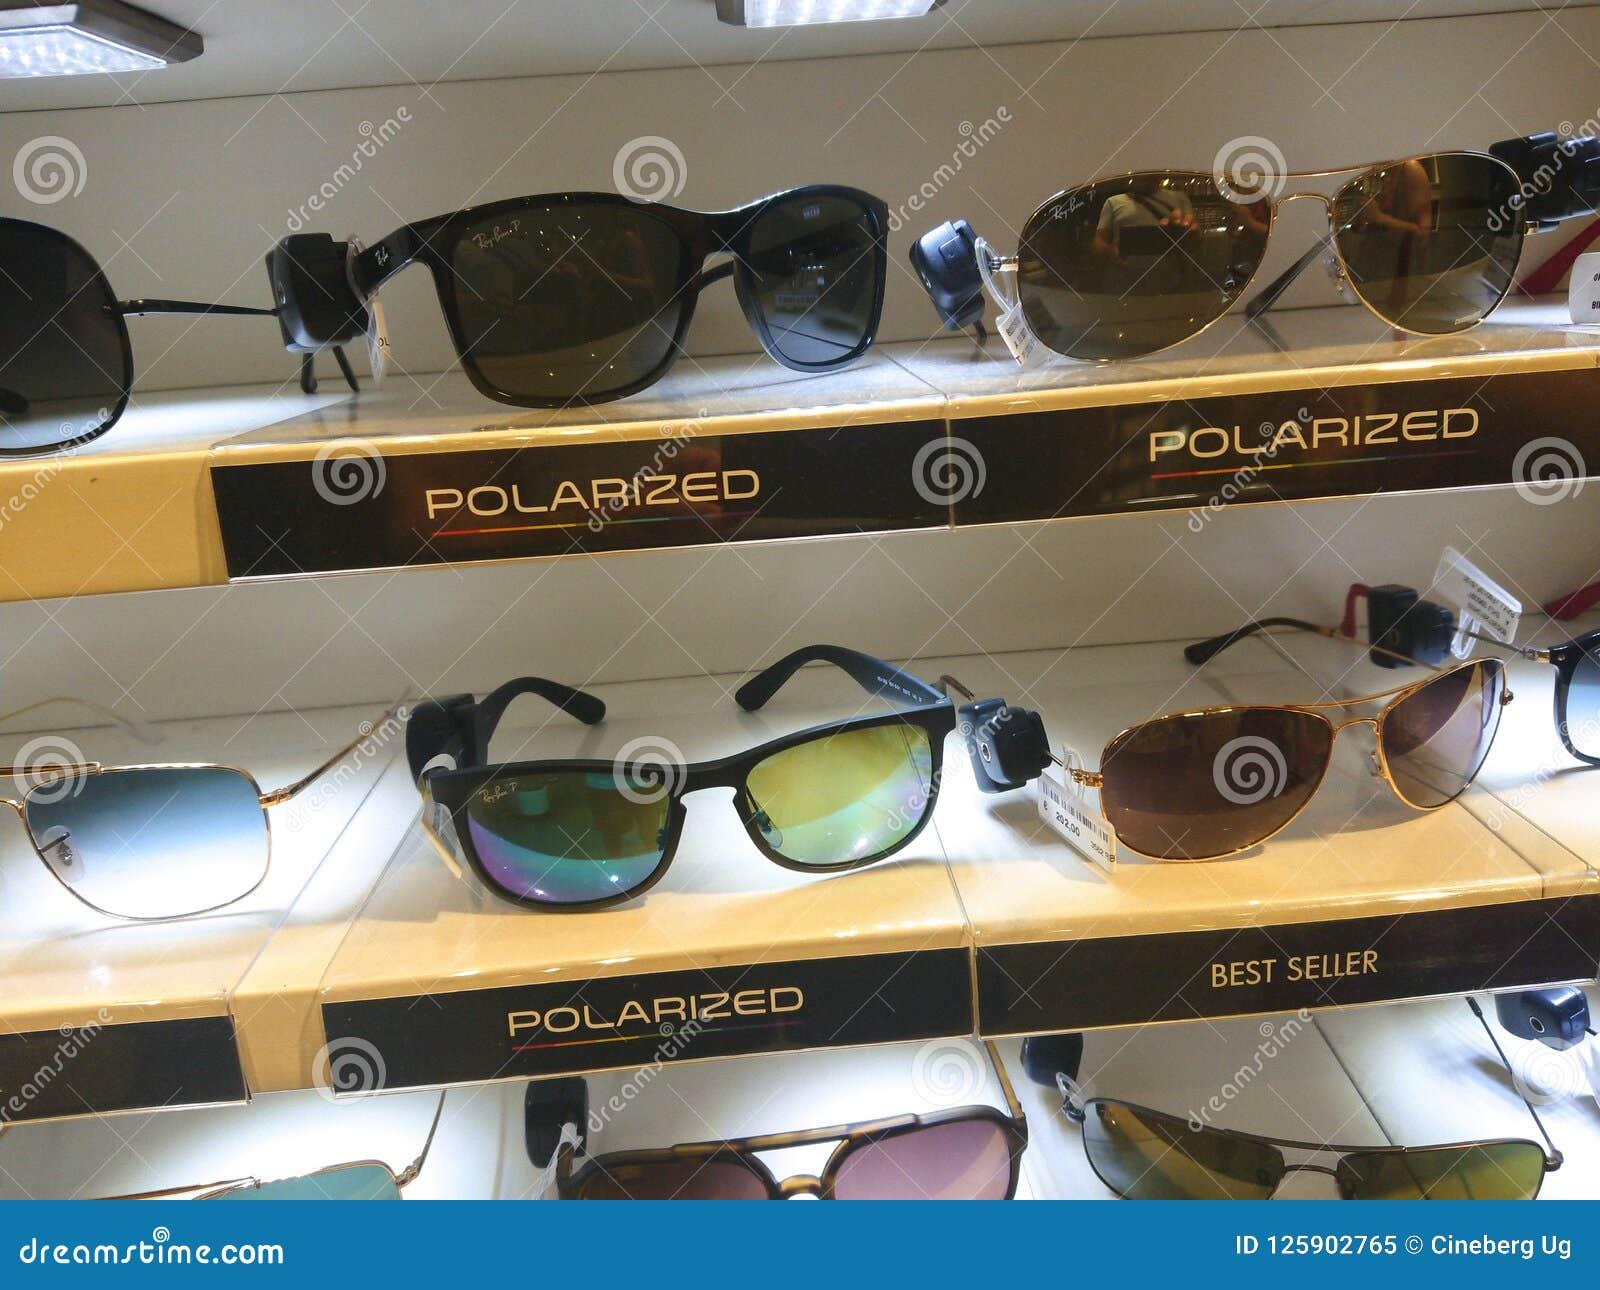 63efa96e105 Polarized Sunglasses For Sale Editorial Image - Image of accessories ...